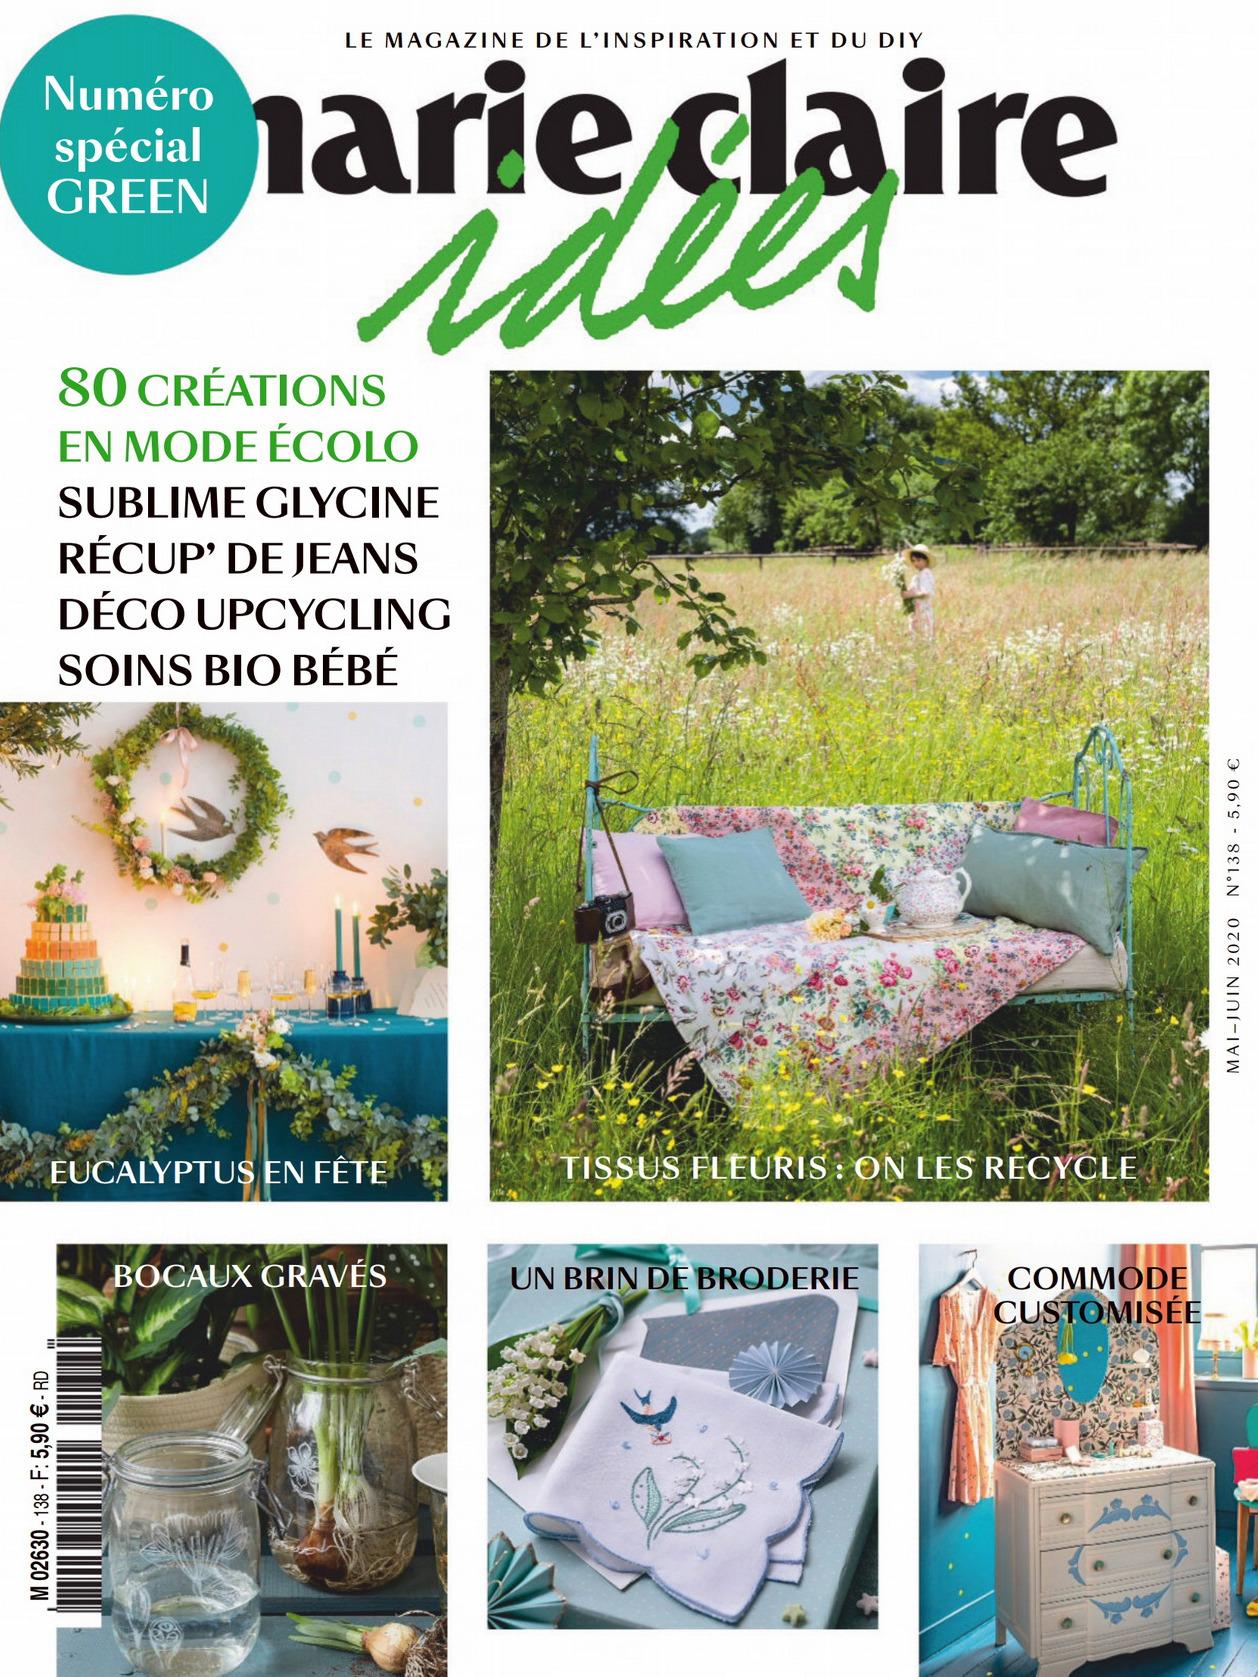 《Marie Claire Idees》法国版时尚综合杂志2020年05-06月号